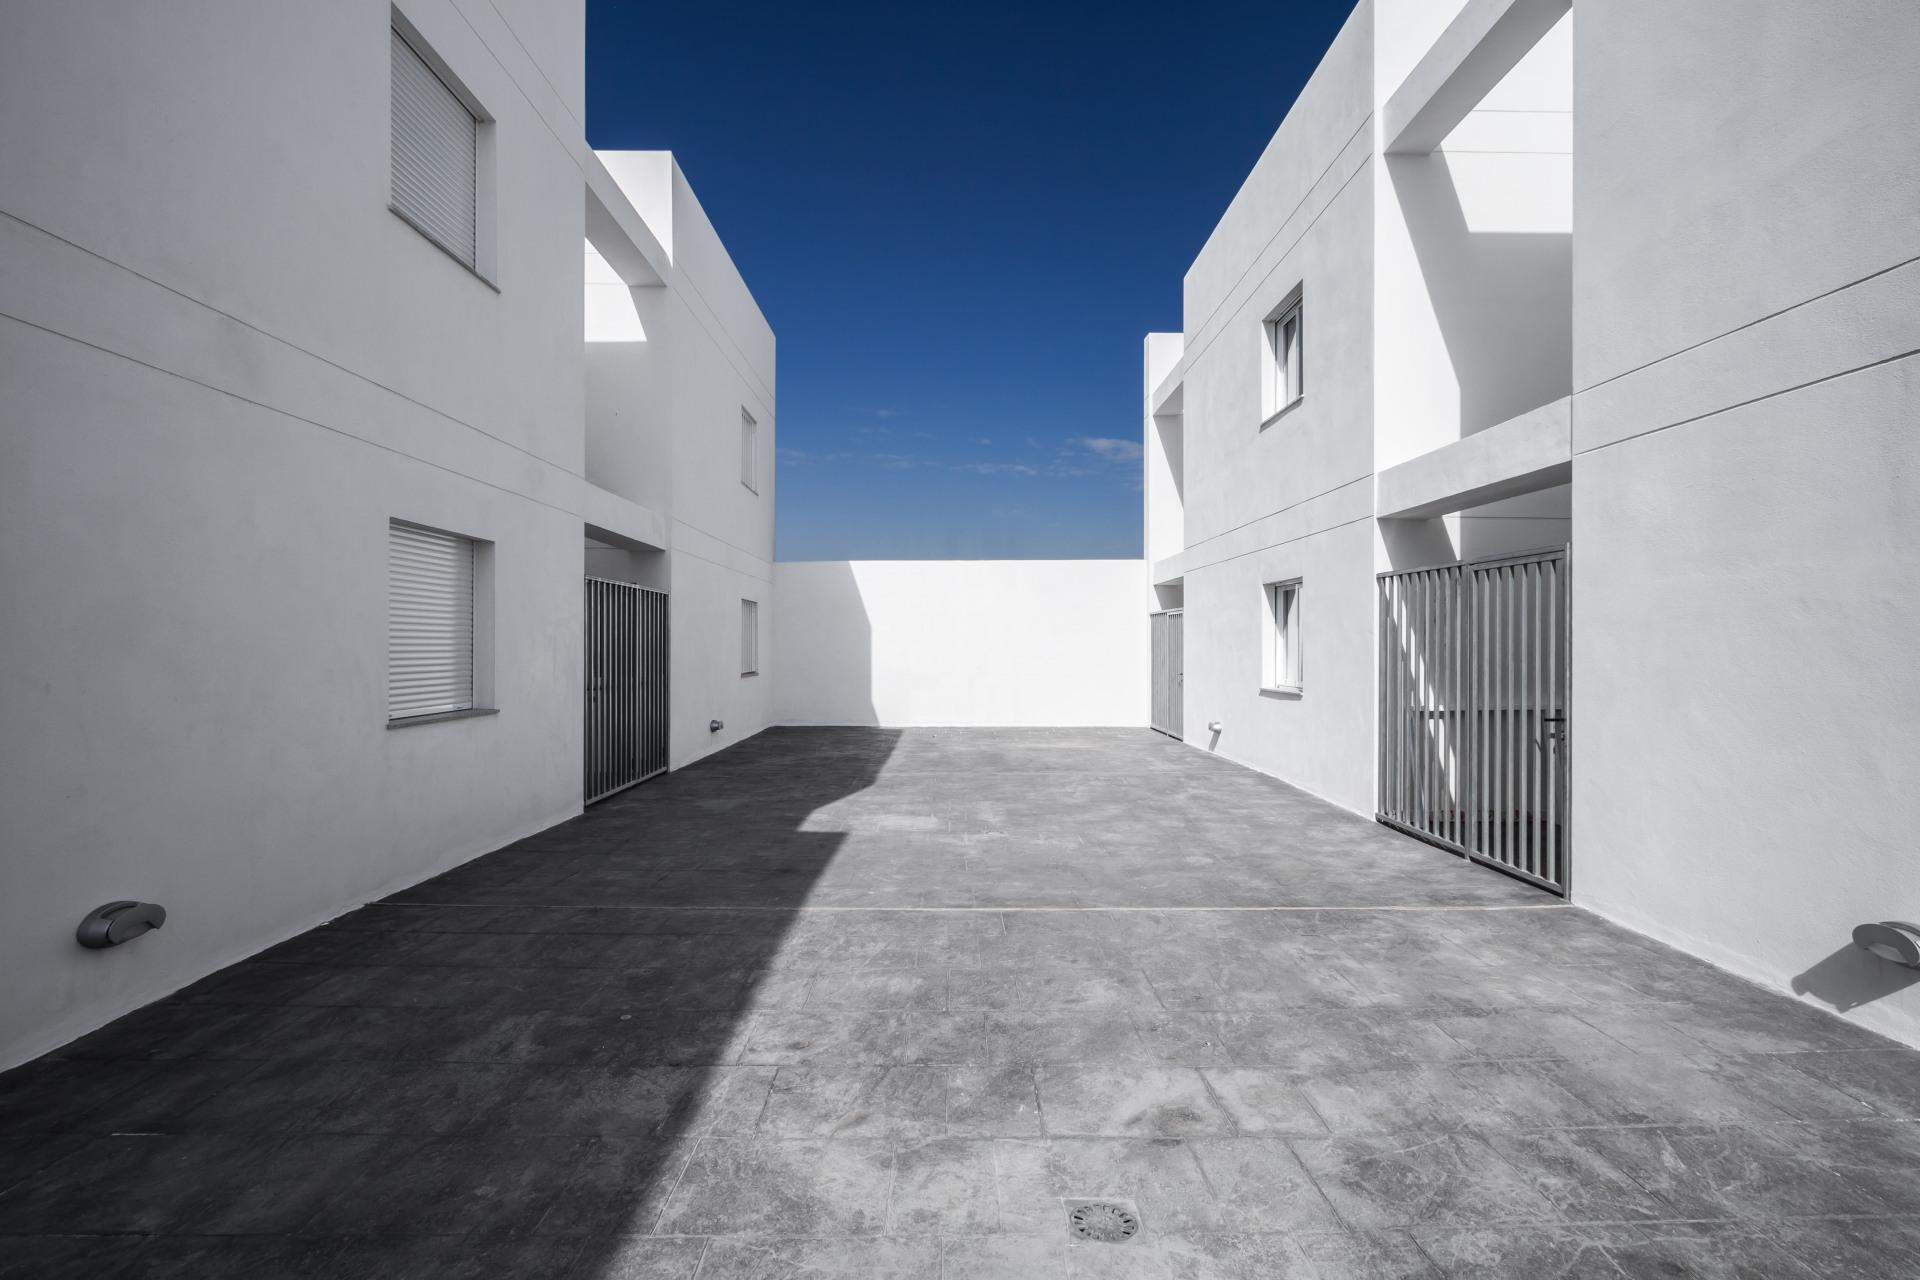 fotografia-arquitectura-valencia-german-cabo-viraje-sagunto (7)